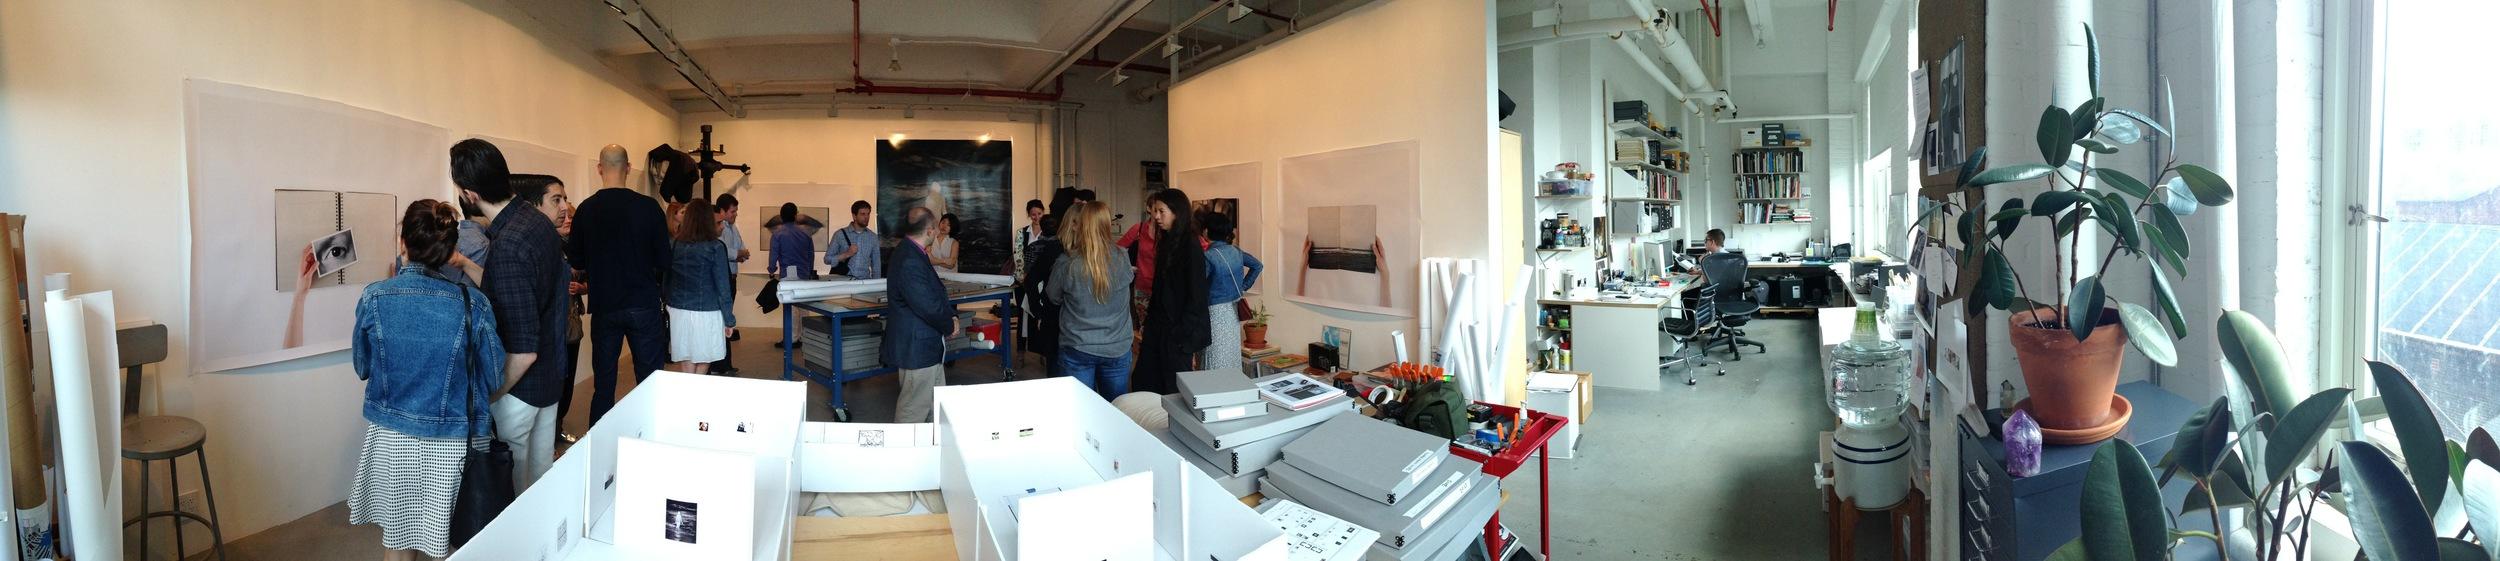 Anne Collier Studio, Brooklyn Navy Yards Photo Credit: Cincala Art Advisory